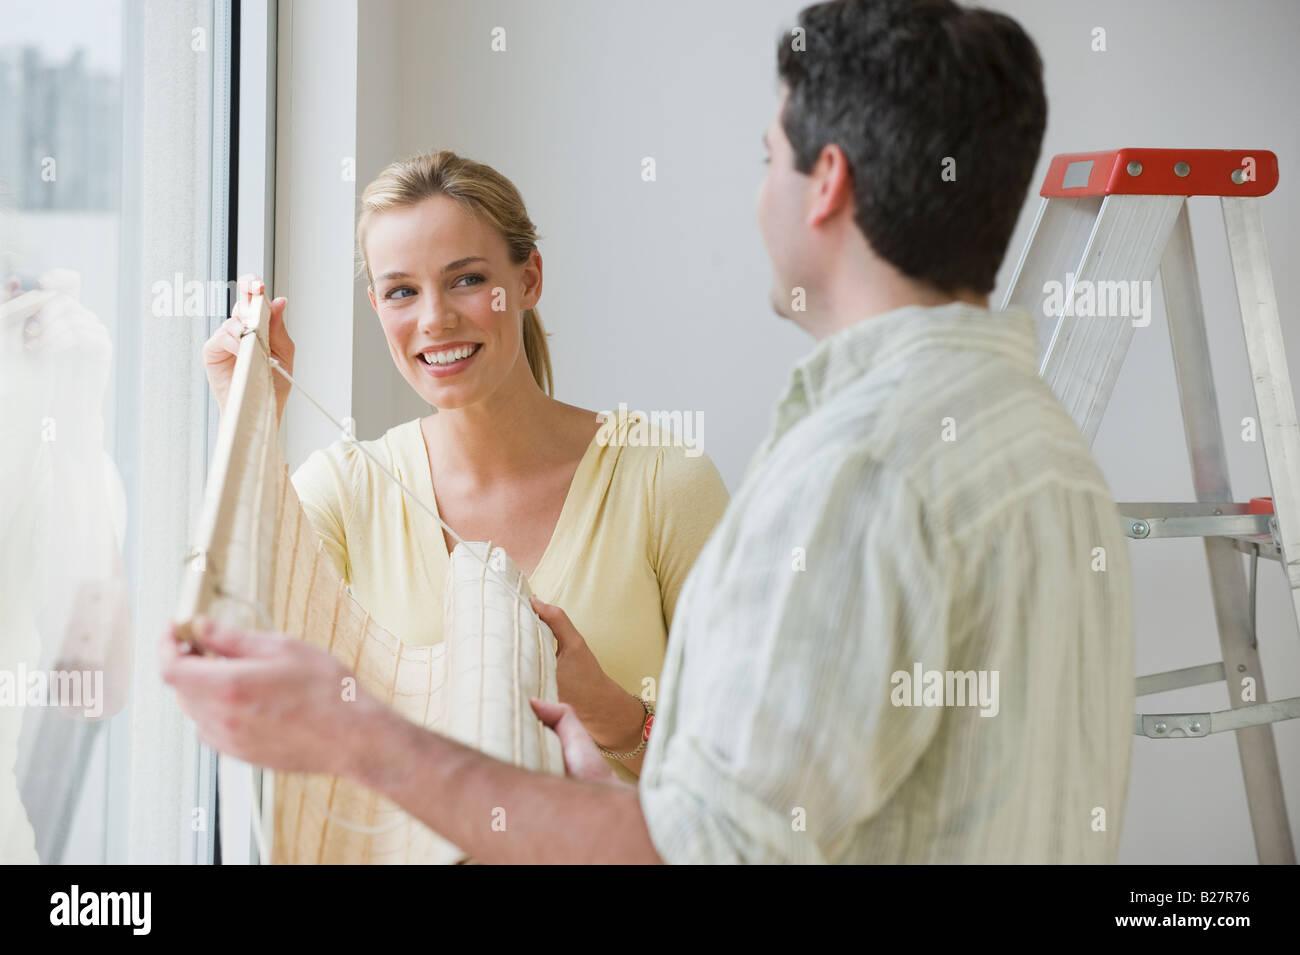 Couple hanging window blinds - Stock Image